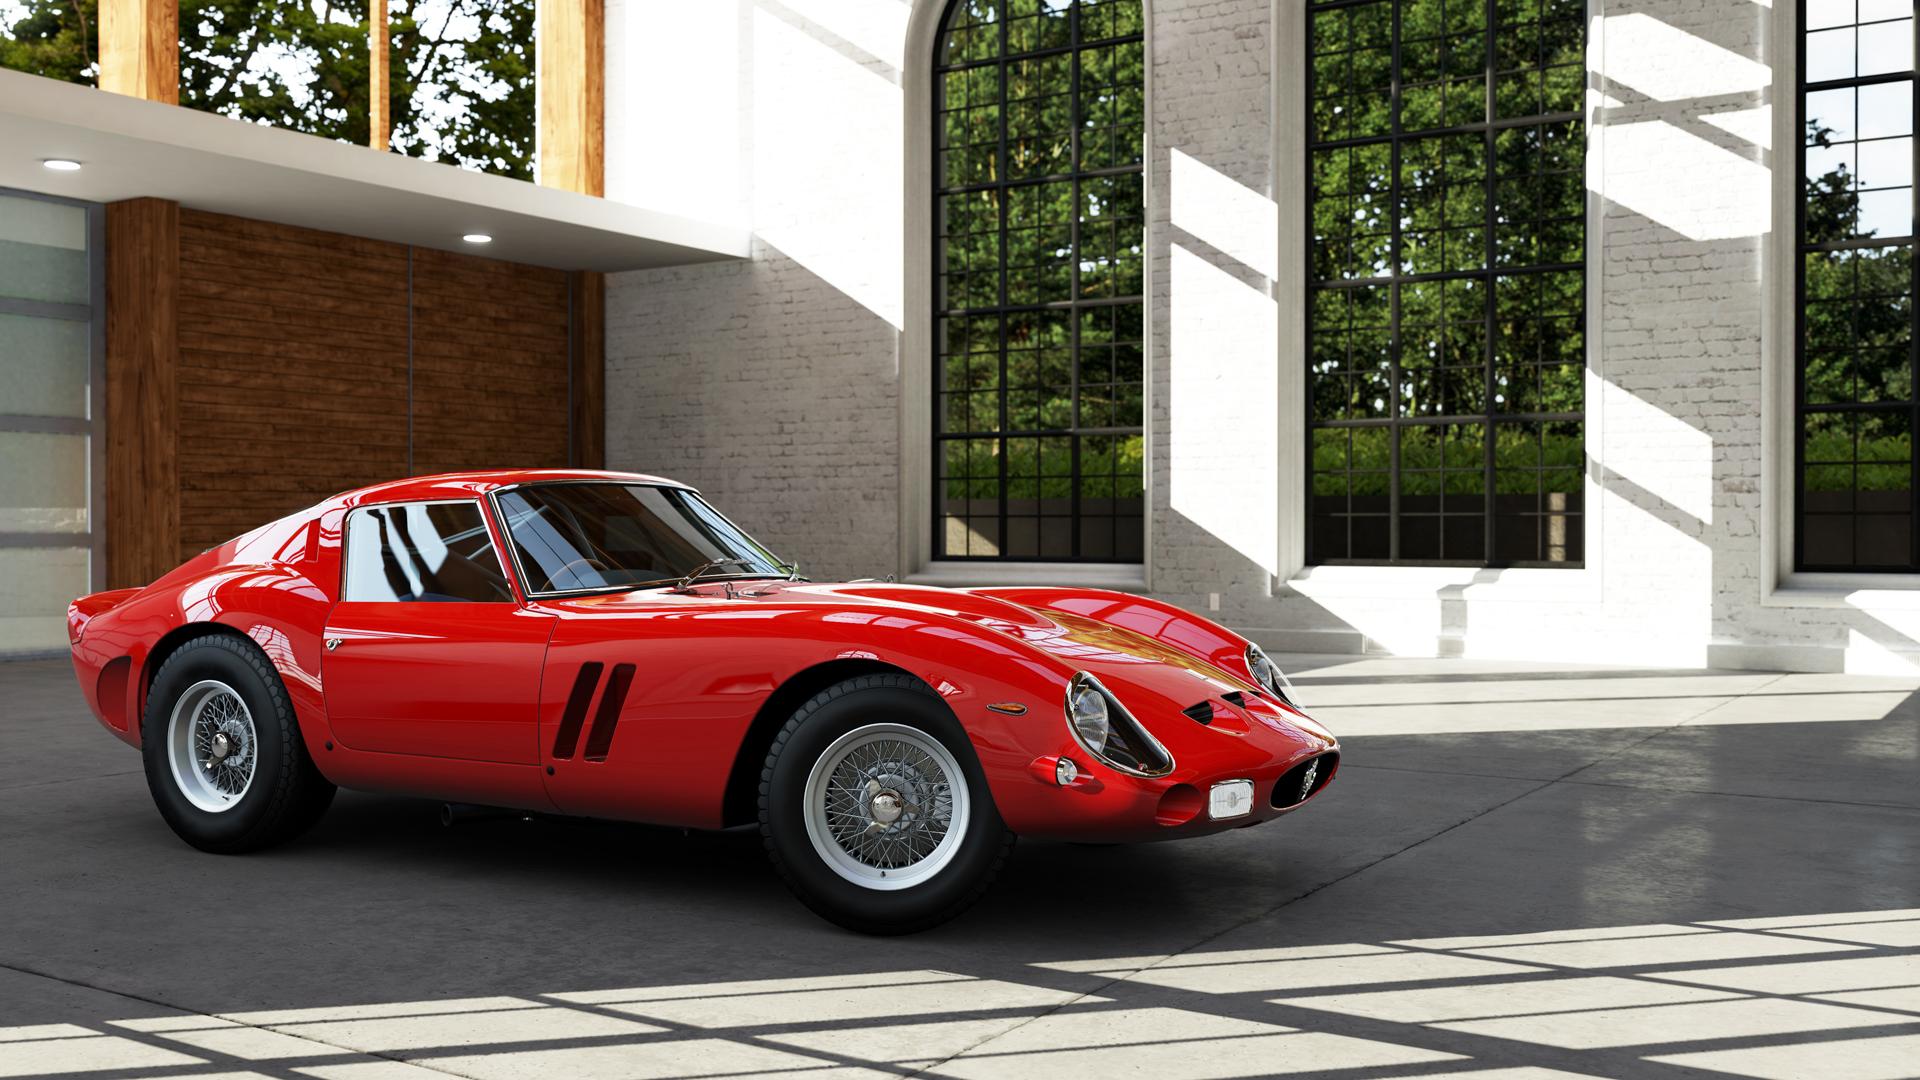 1962, Ferrari, 250 GTO, Rs 306 cr, auction, NewsMobile, Mobile news, Auto, Car, India